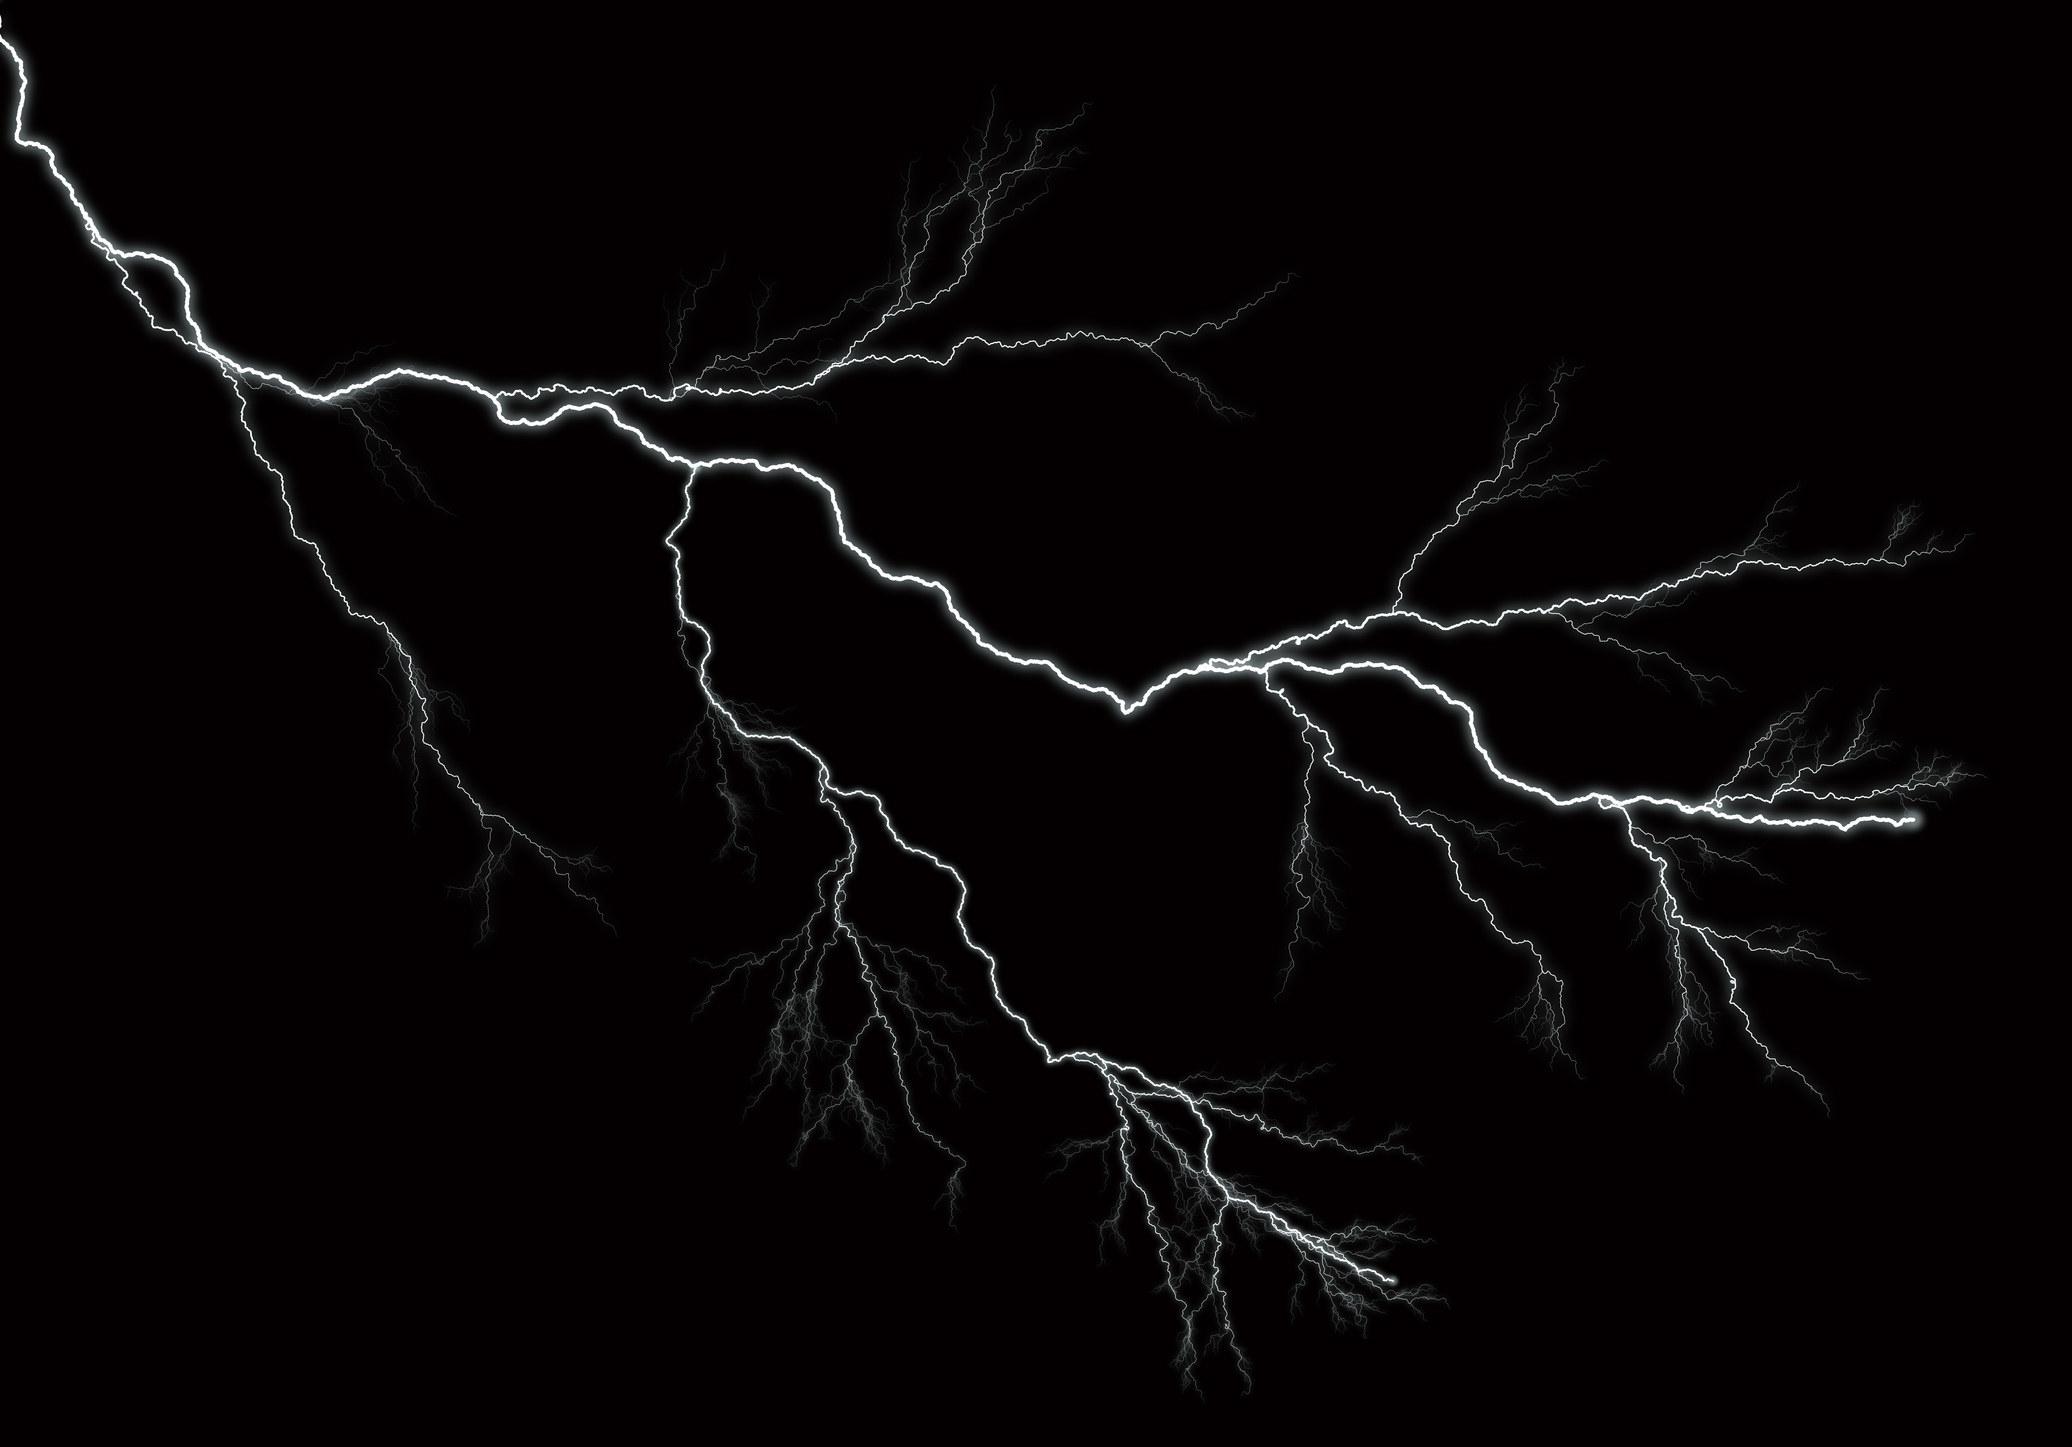 One strike of lightning